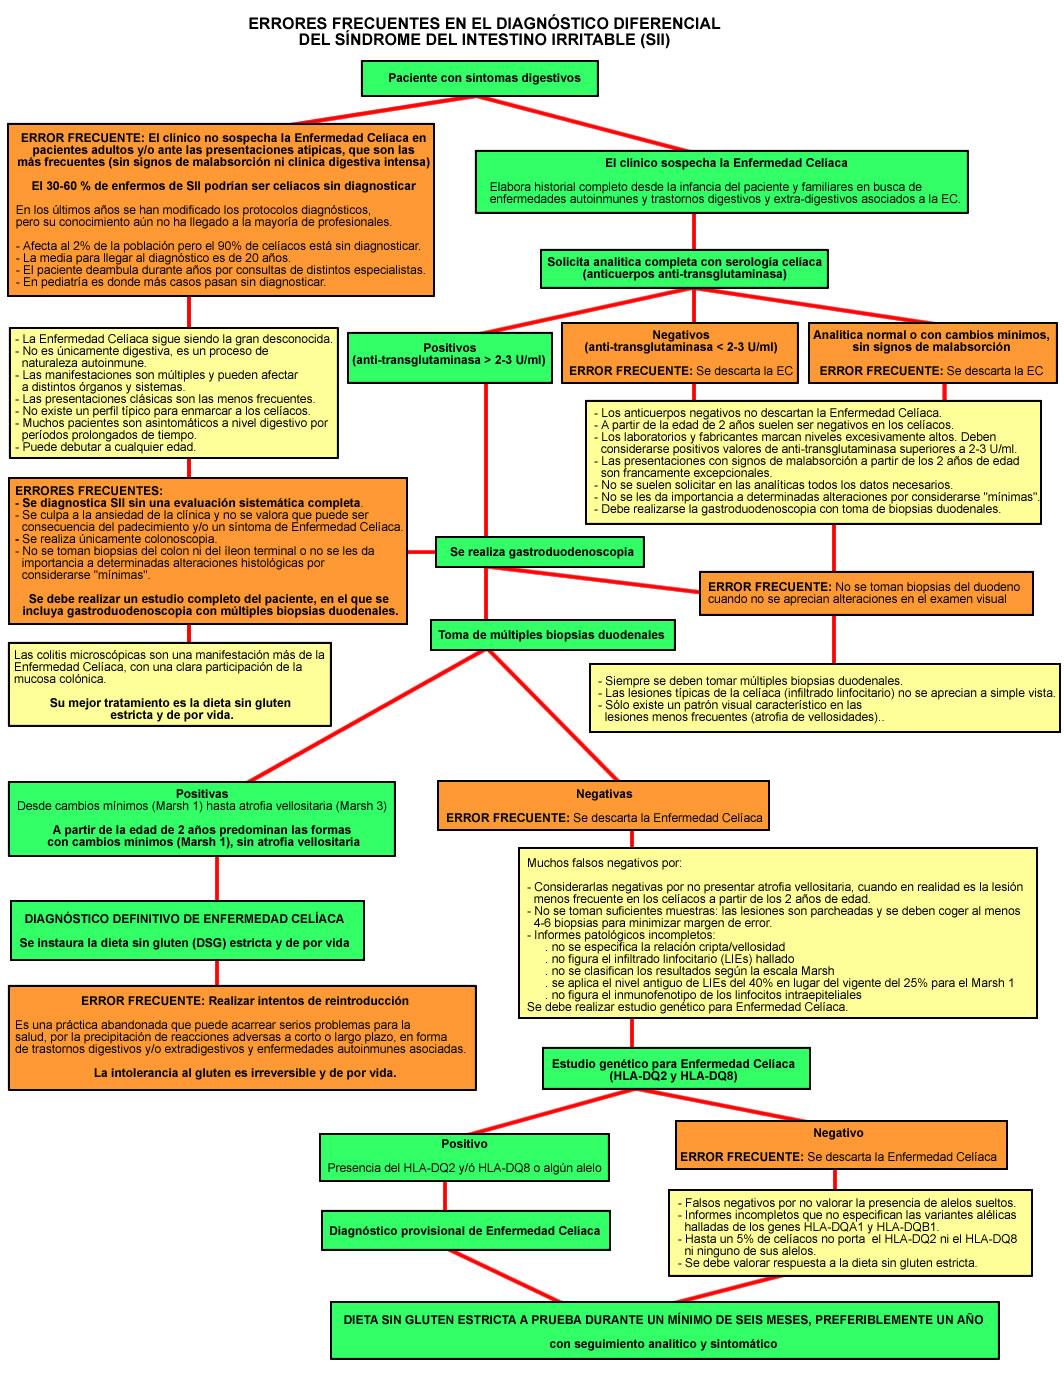 File:SII - Diagrama errores diagnosticos.jpg - Wikimedia Commons